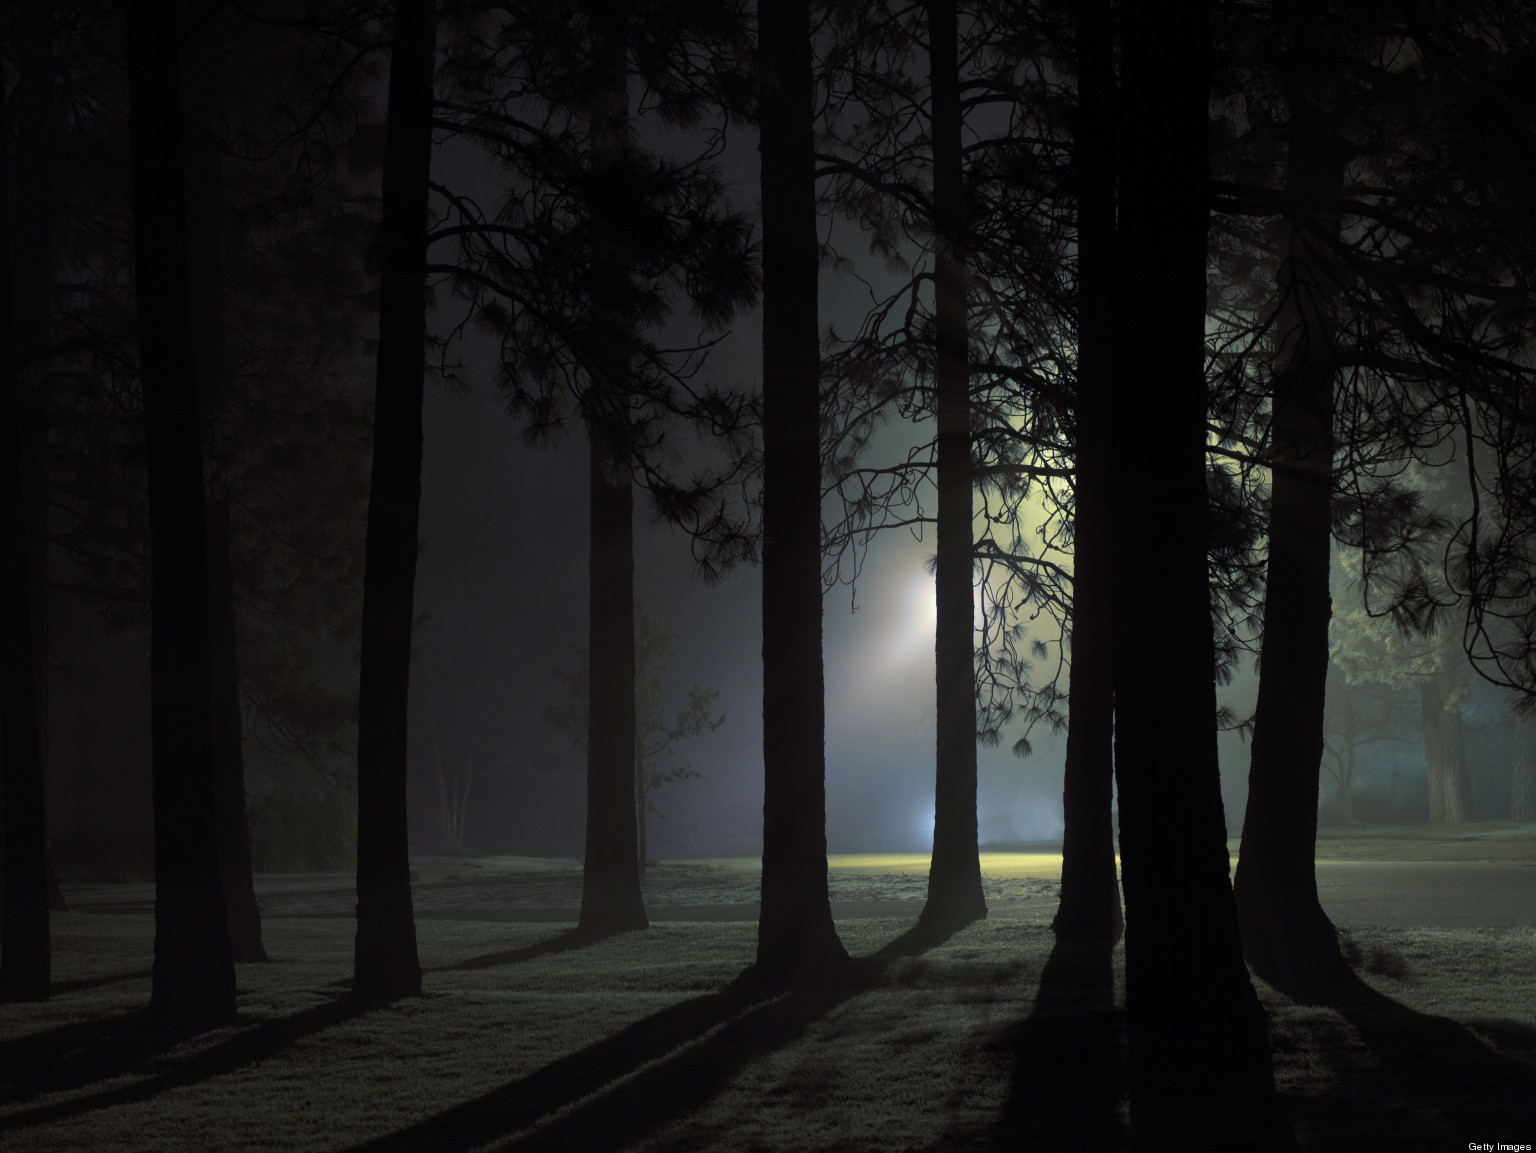 Paranormal Activity Haunts Santa Cruz Mountains | HuffPost